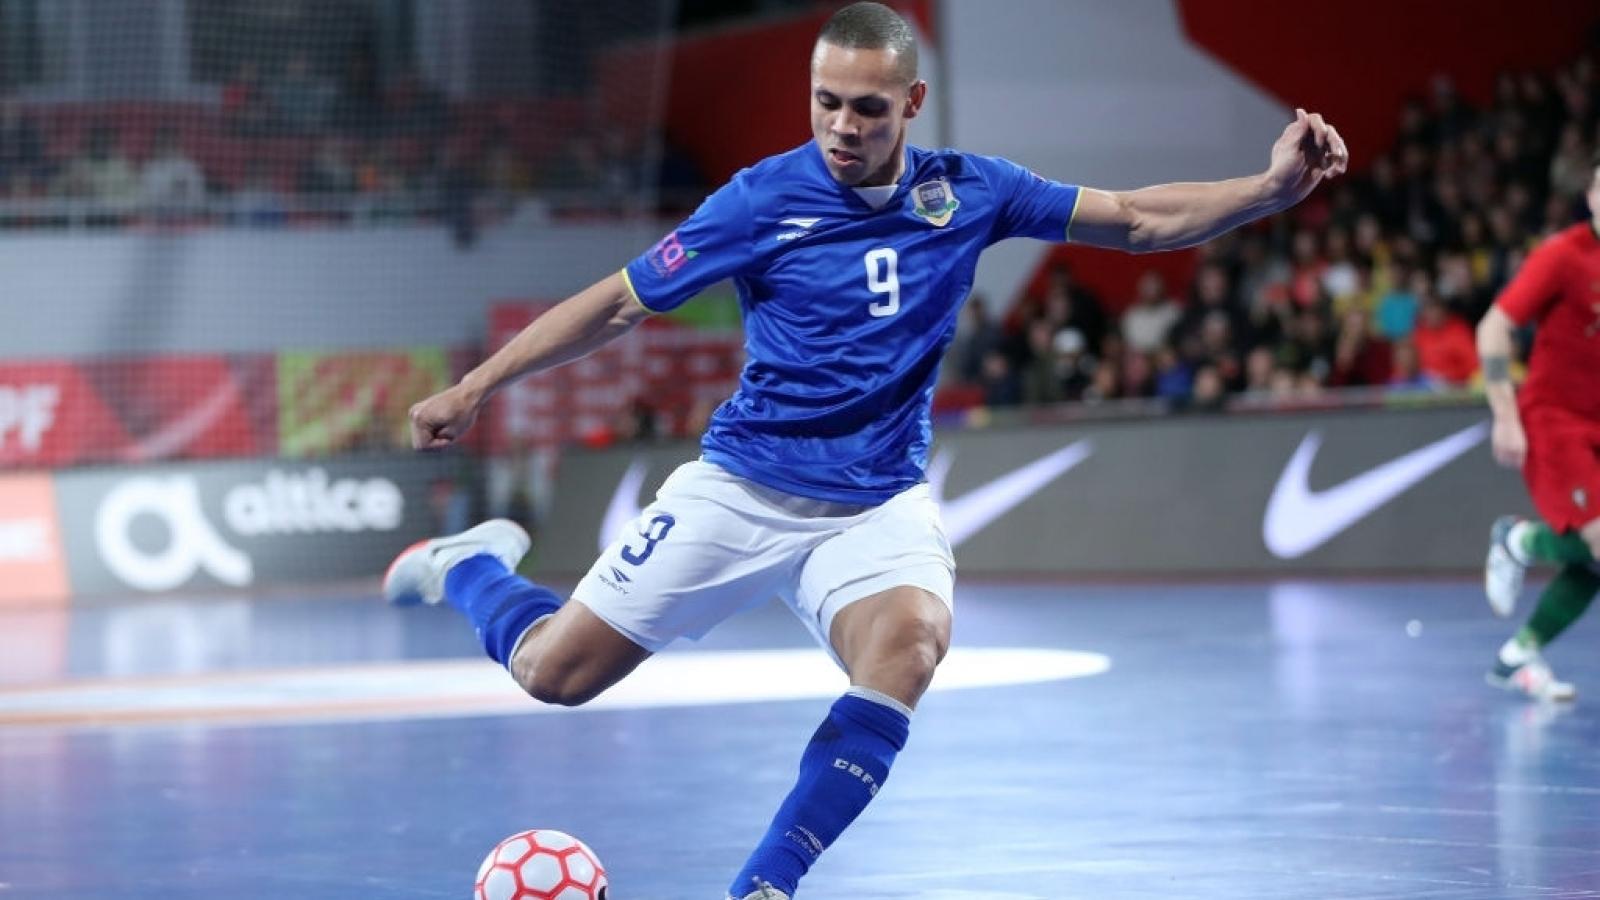 ĐT Futsal Brazil triệu tập siêu sao đấu ĐT Futsal Việt Nam ở Futsal World Cup 2021